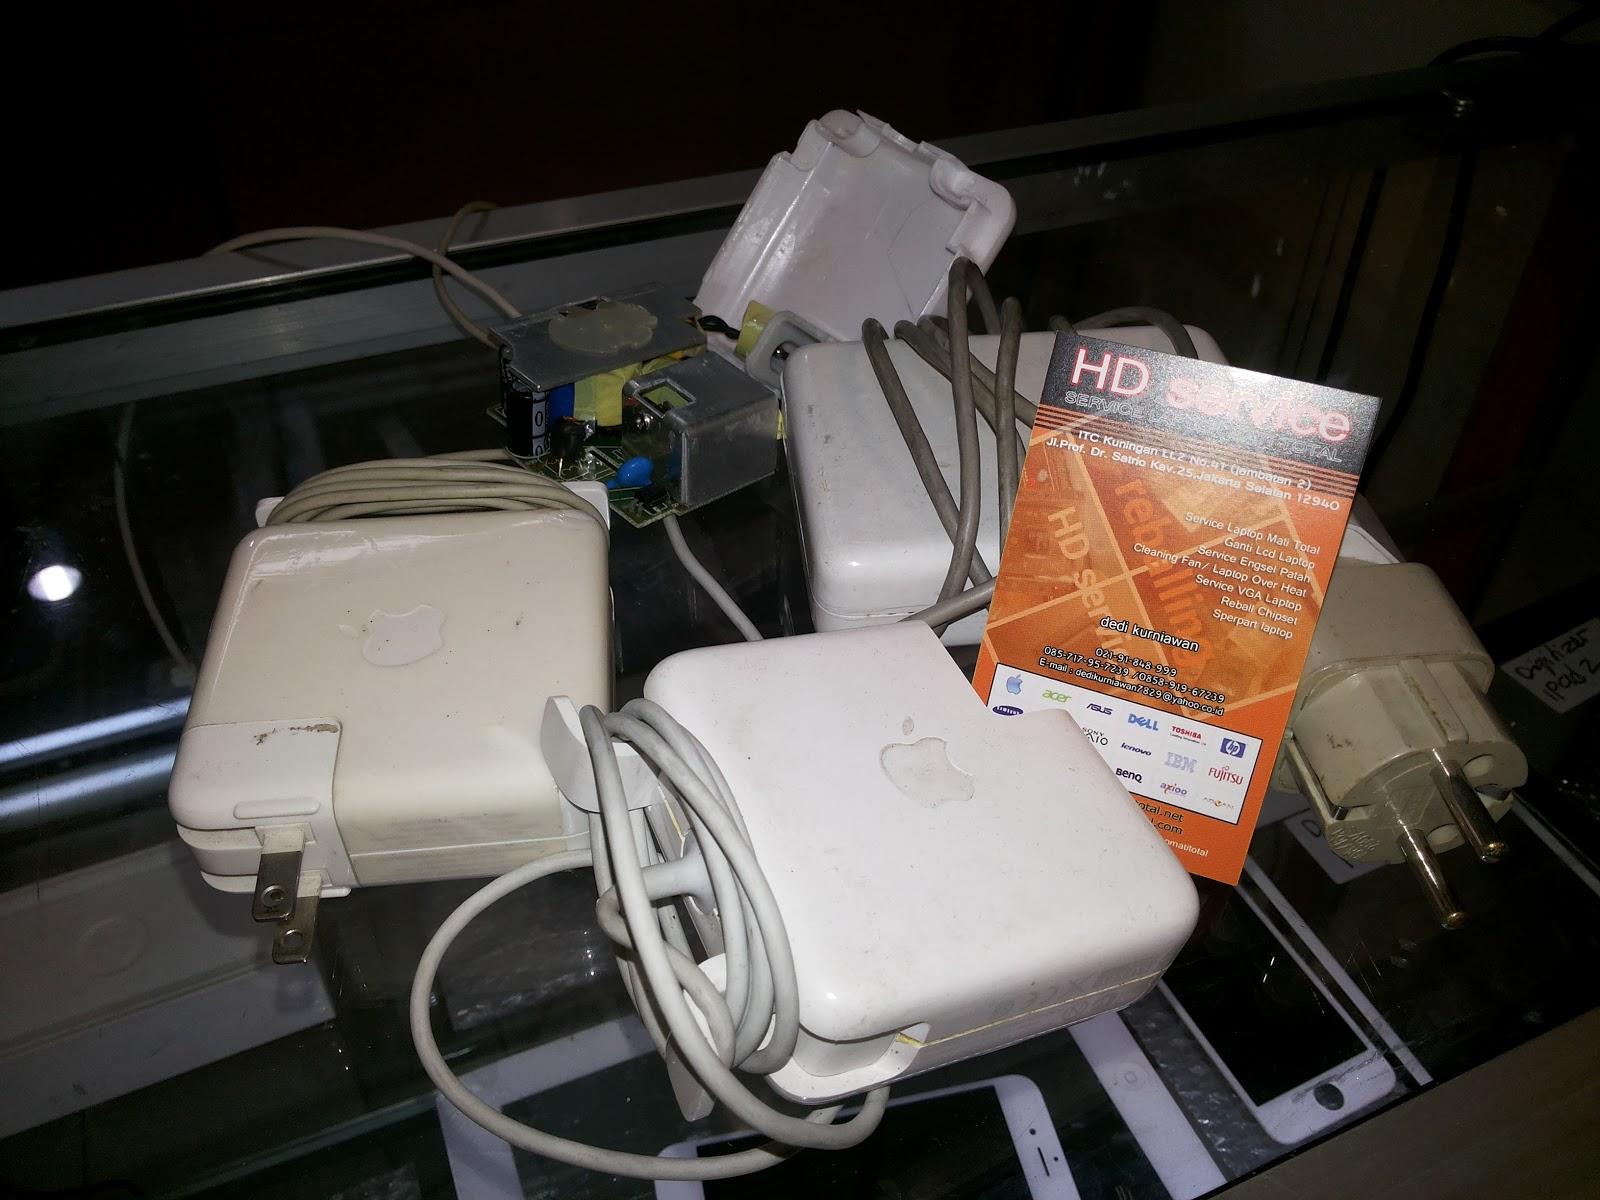 Menerima Service Charger Macbook Jakarta Service Laptop Mati Total